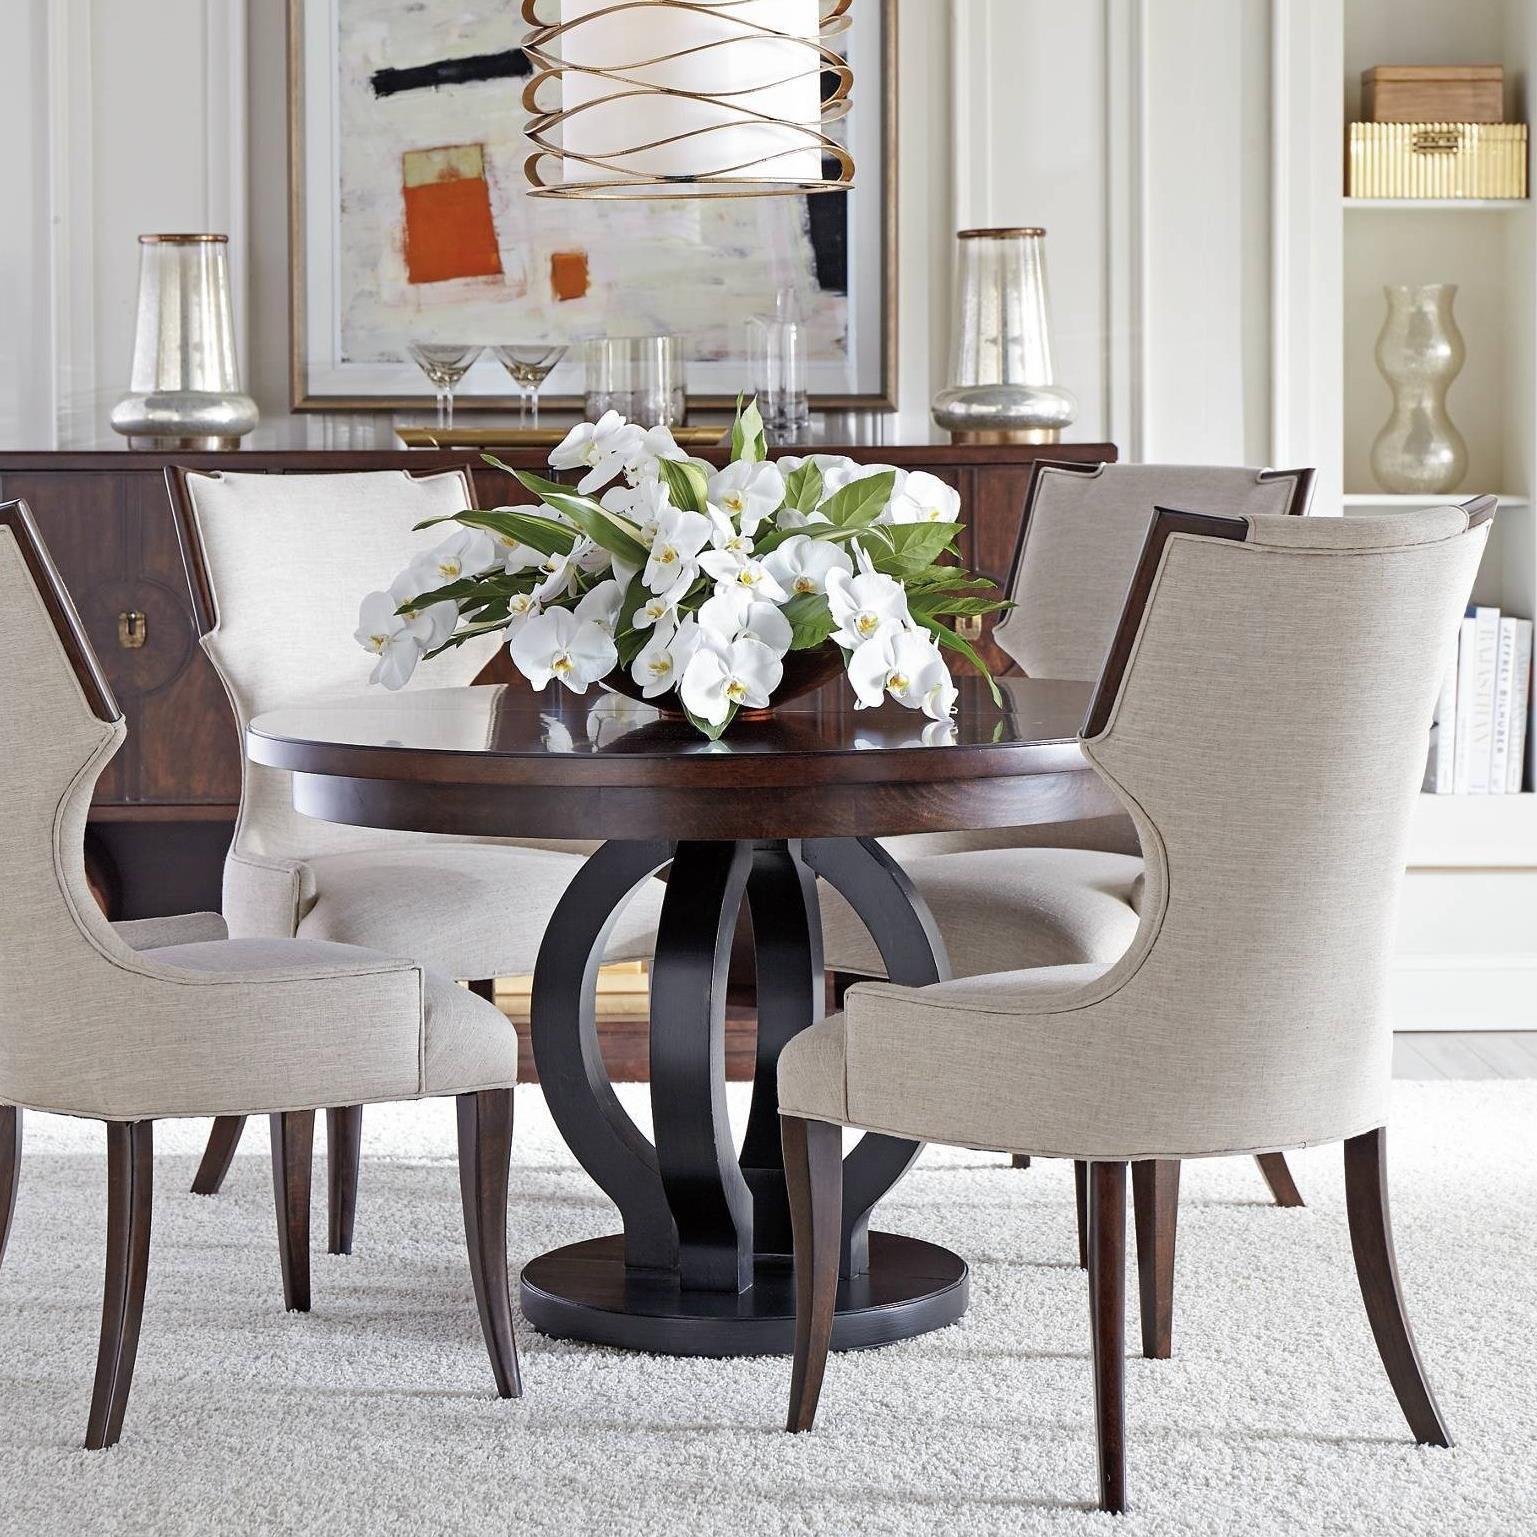 Stanley Furniture Virage 5 Piece Round Dining Table Set